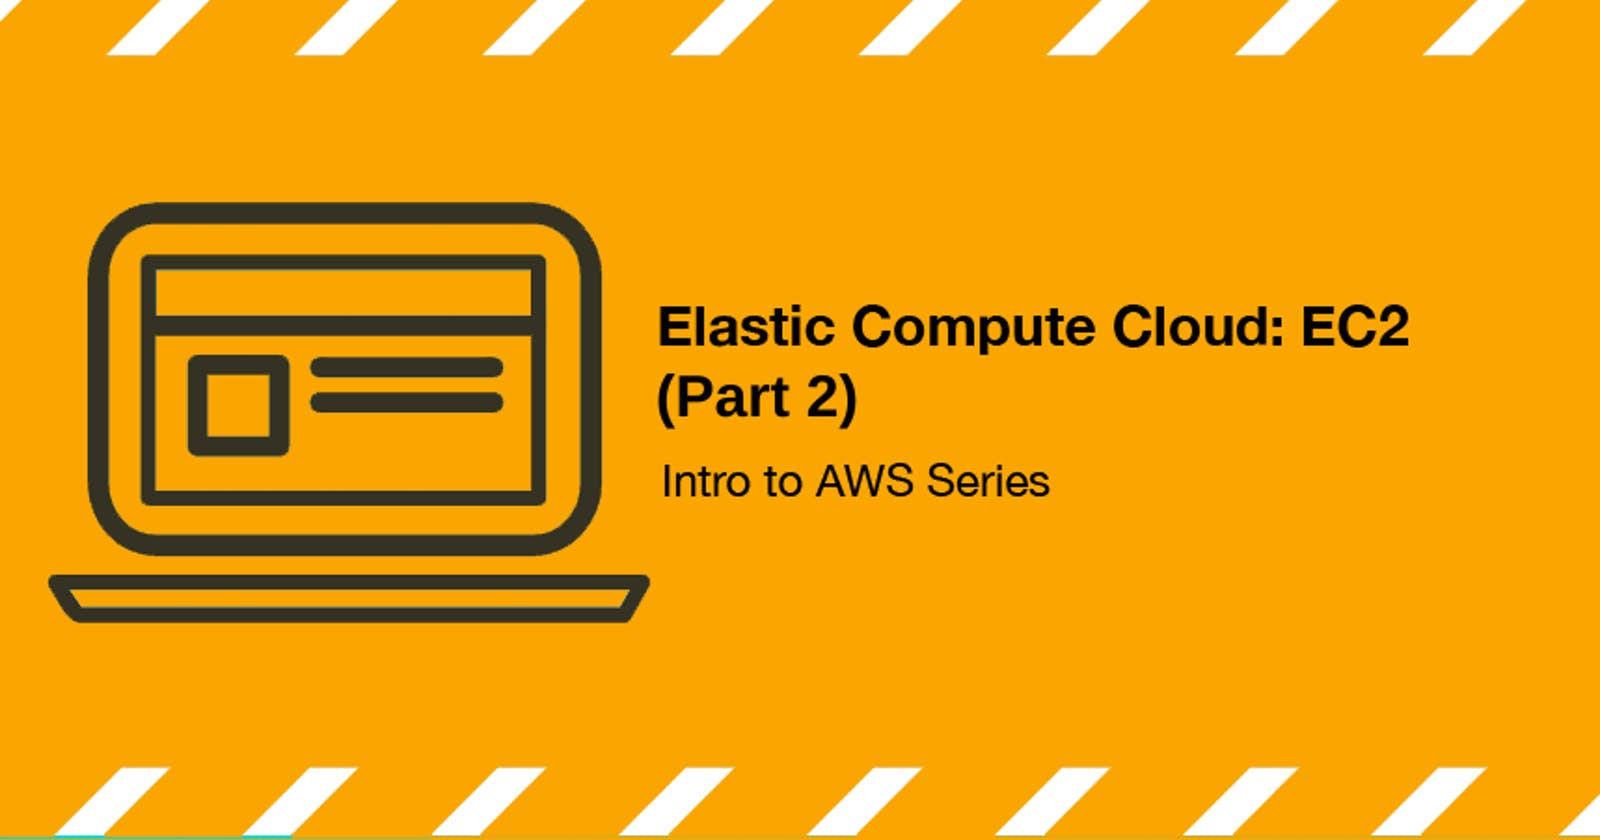 Elastic Compute Cloud: EC2 (Intro to AWS Series) Part 2